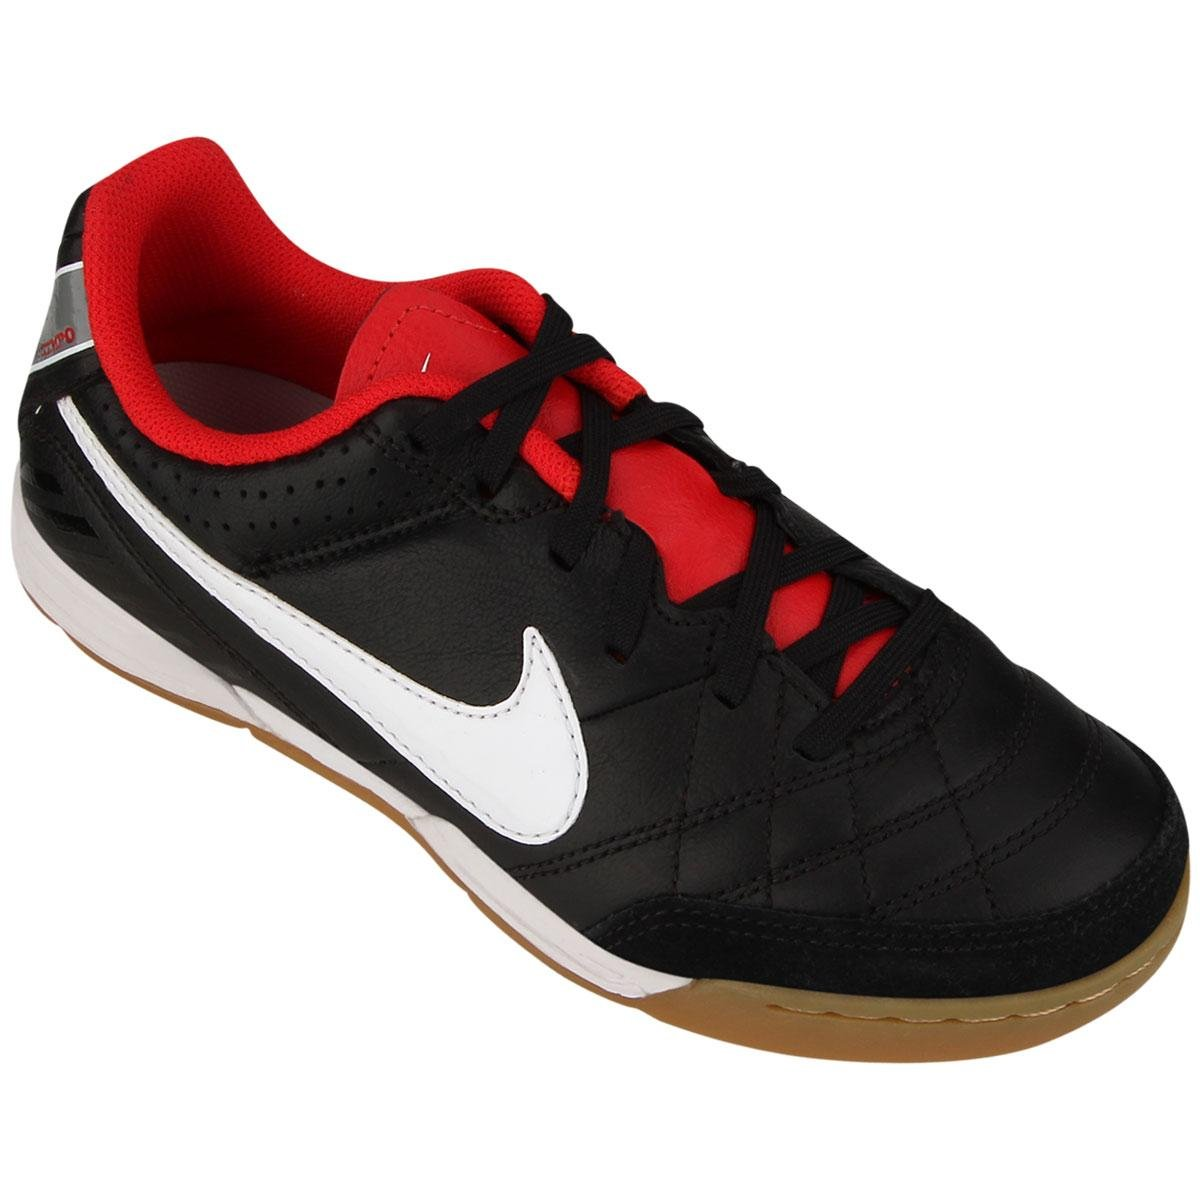 Chuteira Nike Tiempo Natural 4 IC Infantil - Compre Agora  75a7254014a30